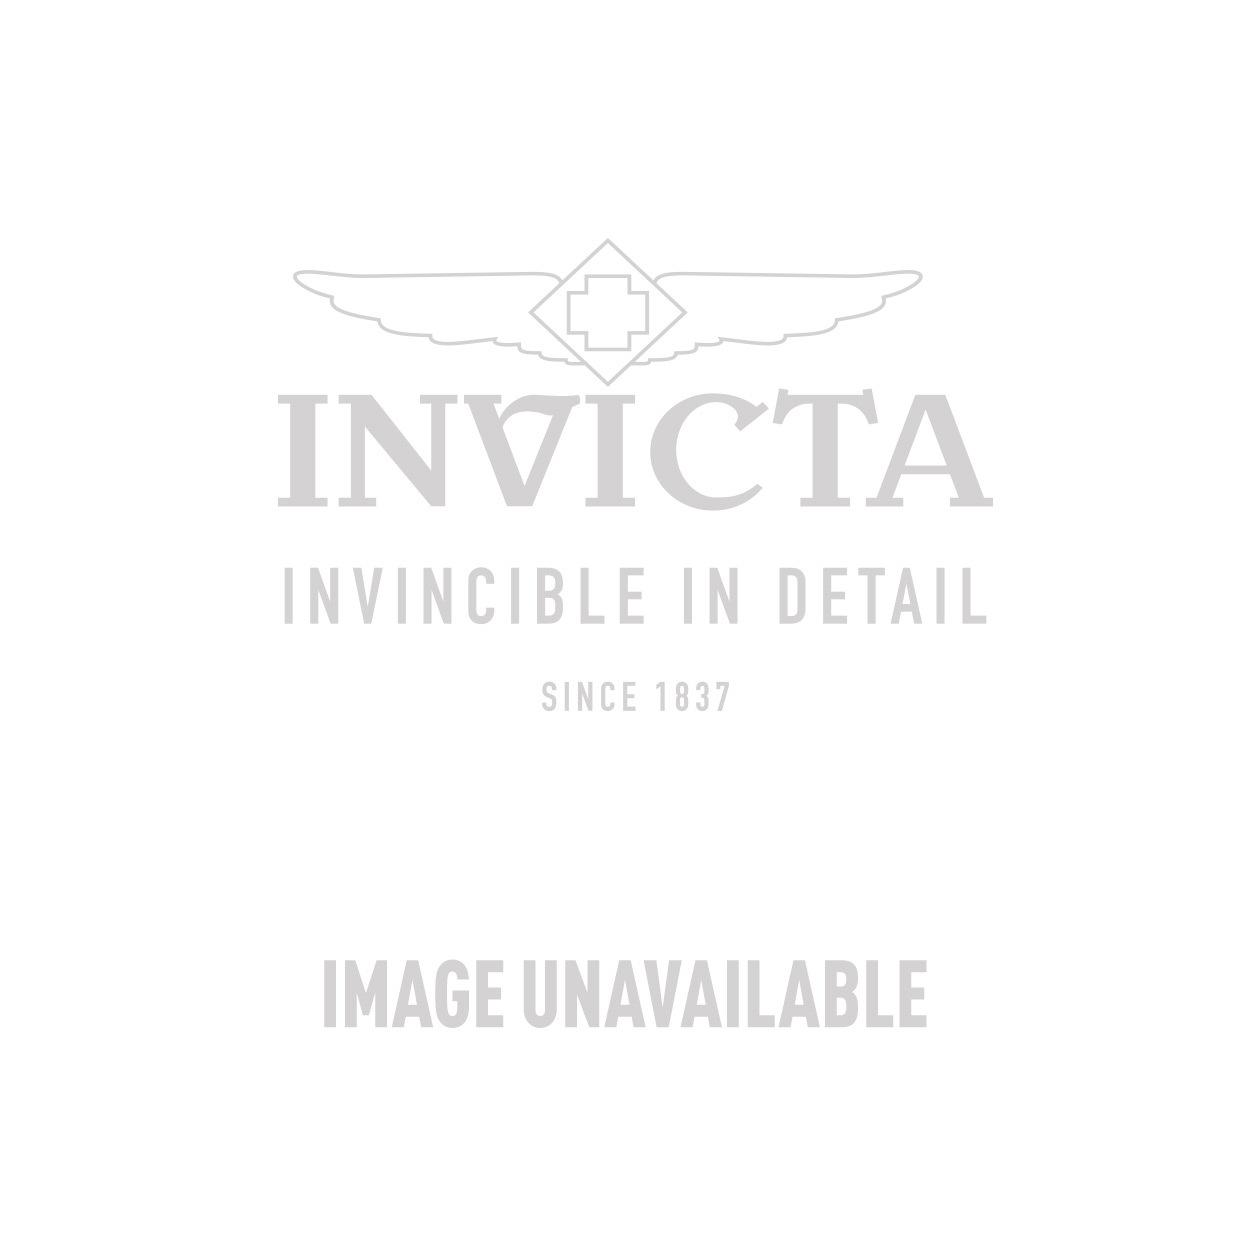 Invicta Speedway Quartz Watch - Black case with Black tone Polyurethane band - Model 20303